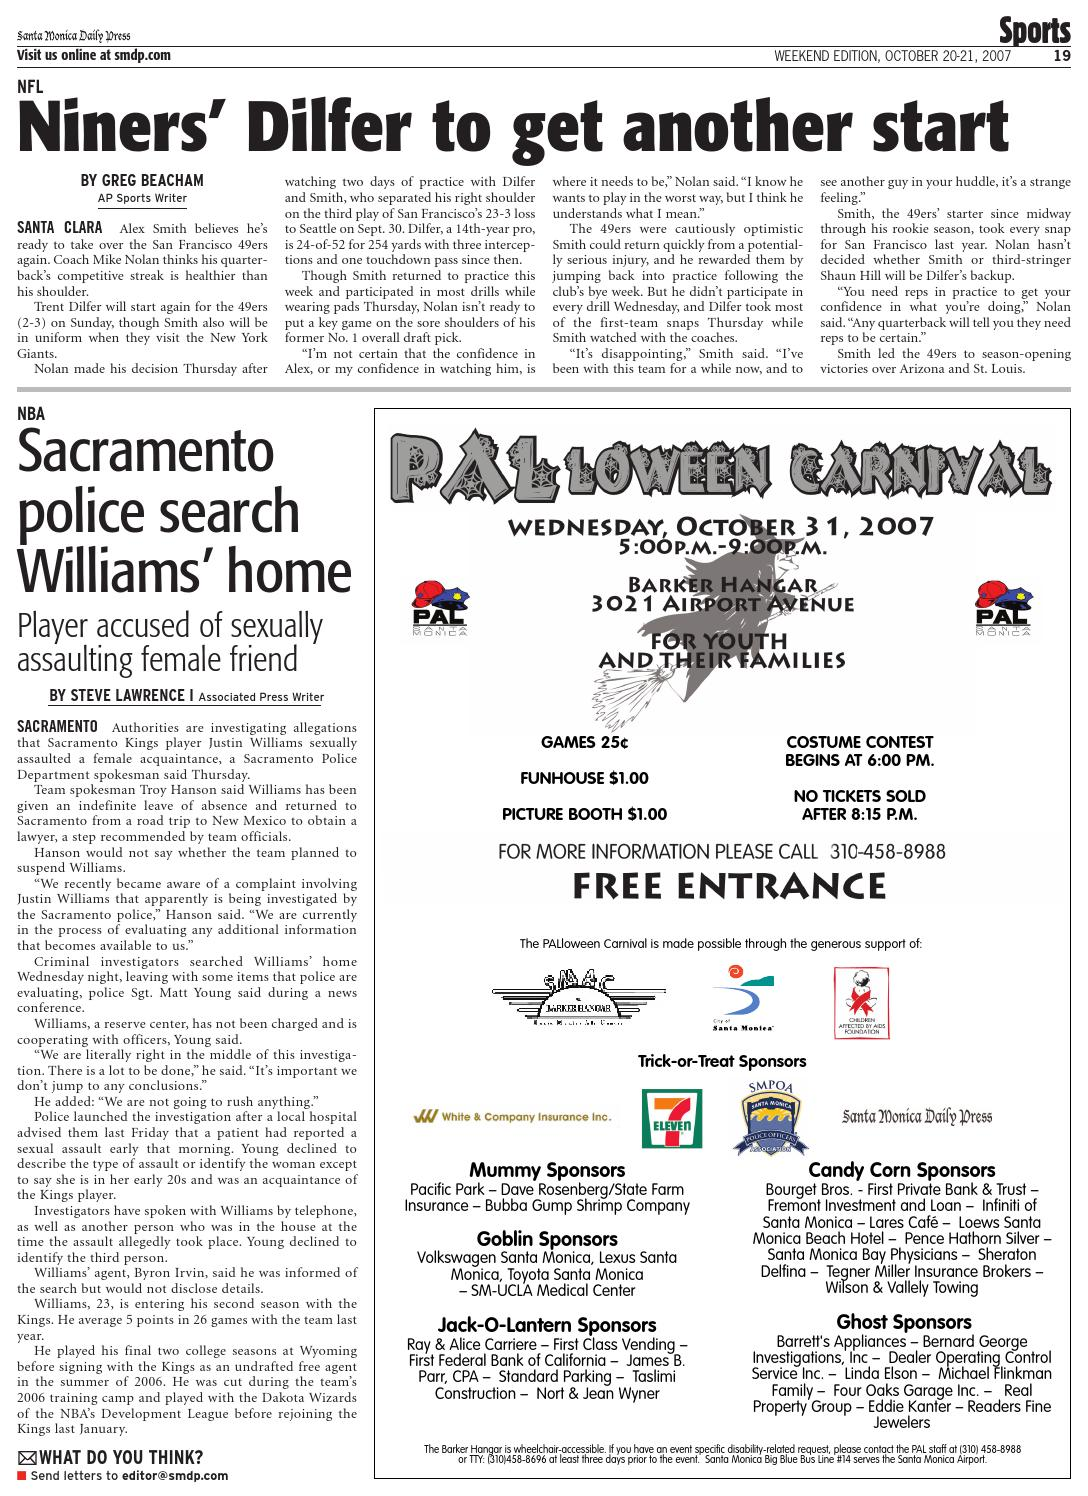 Santa Monica Daily Press, October 20, 2007 by Santa Monica Daily